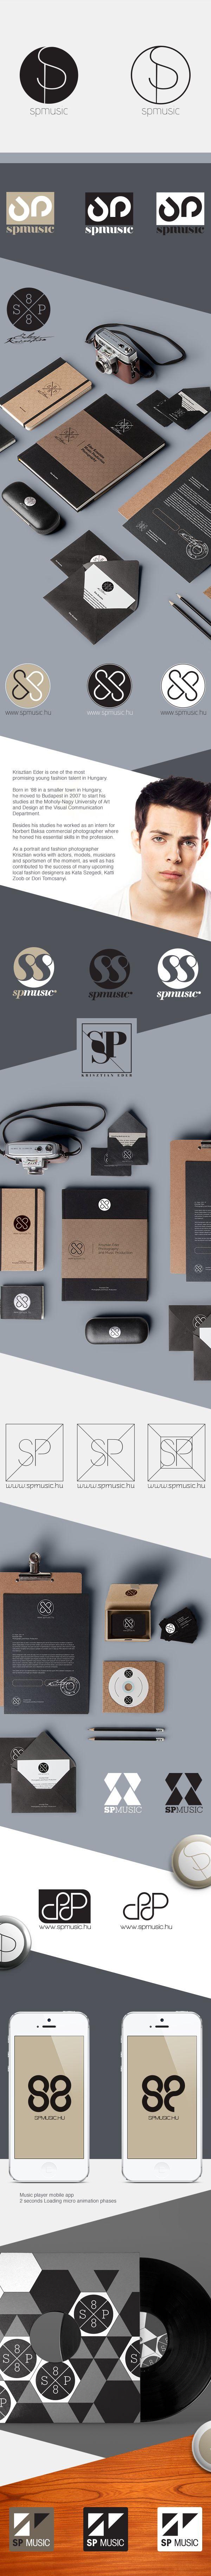 SP Logo / Identity ideas on Behance